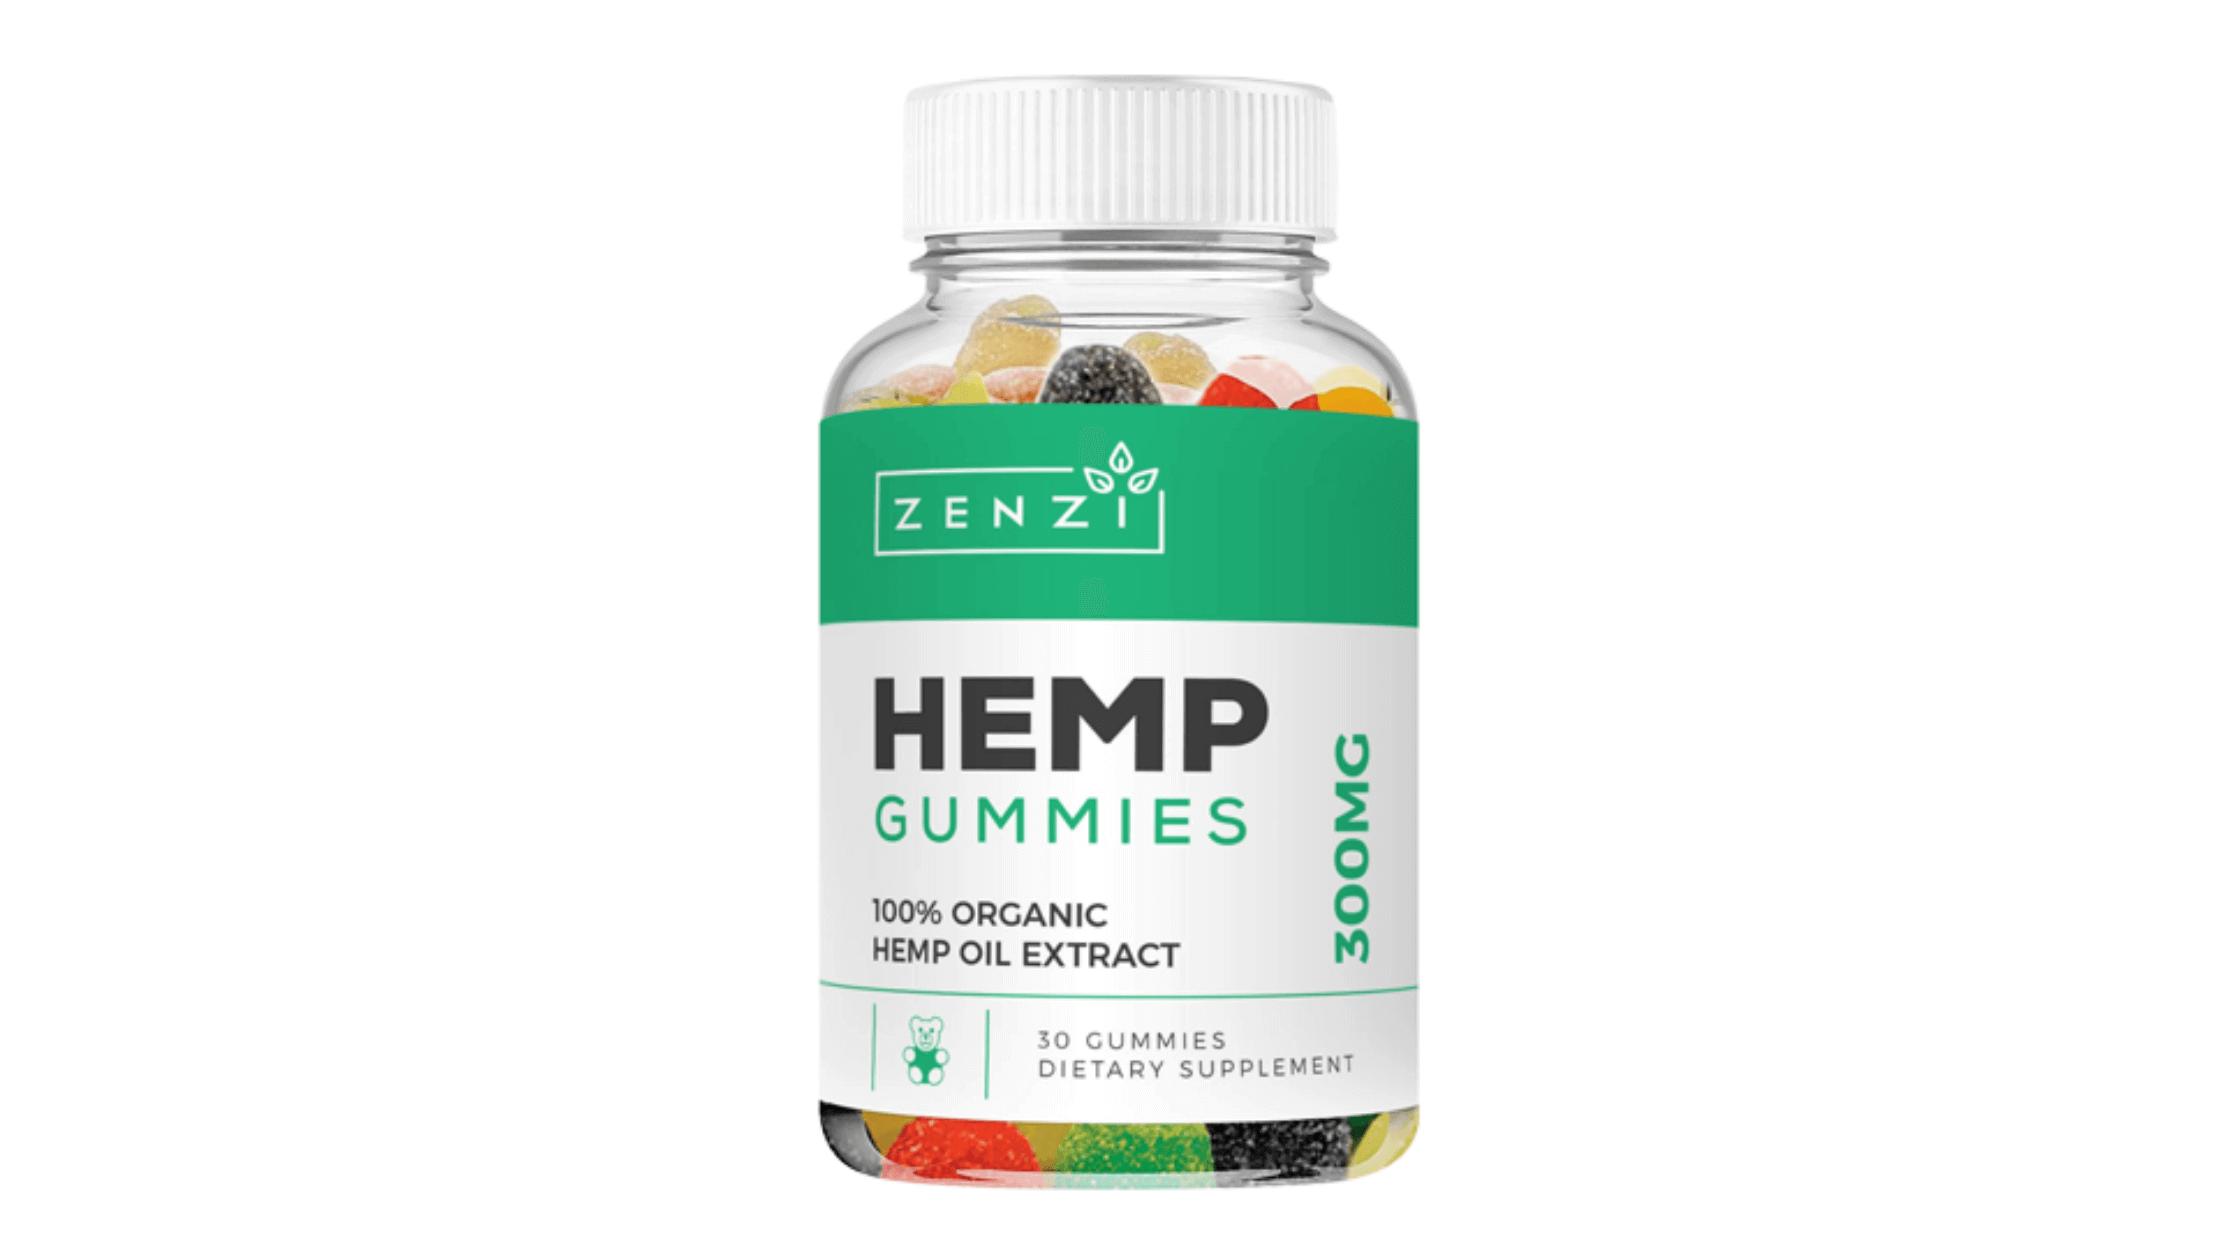 Zenzi Hemp Gummies Reviews